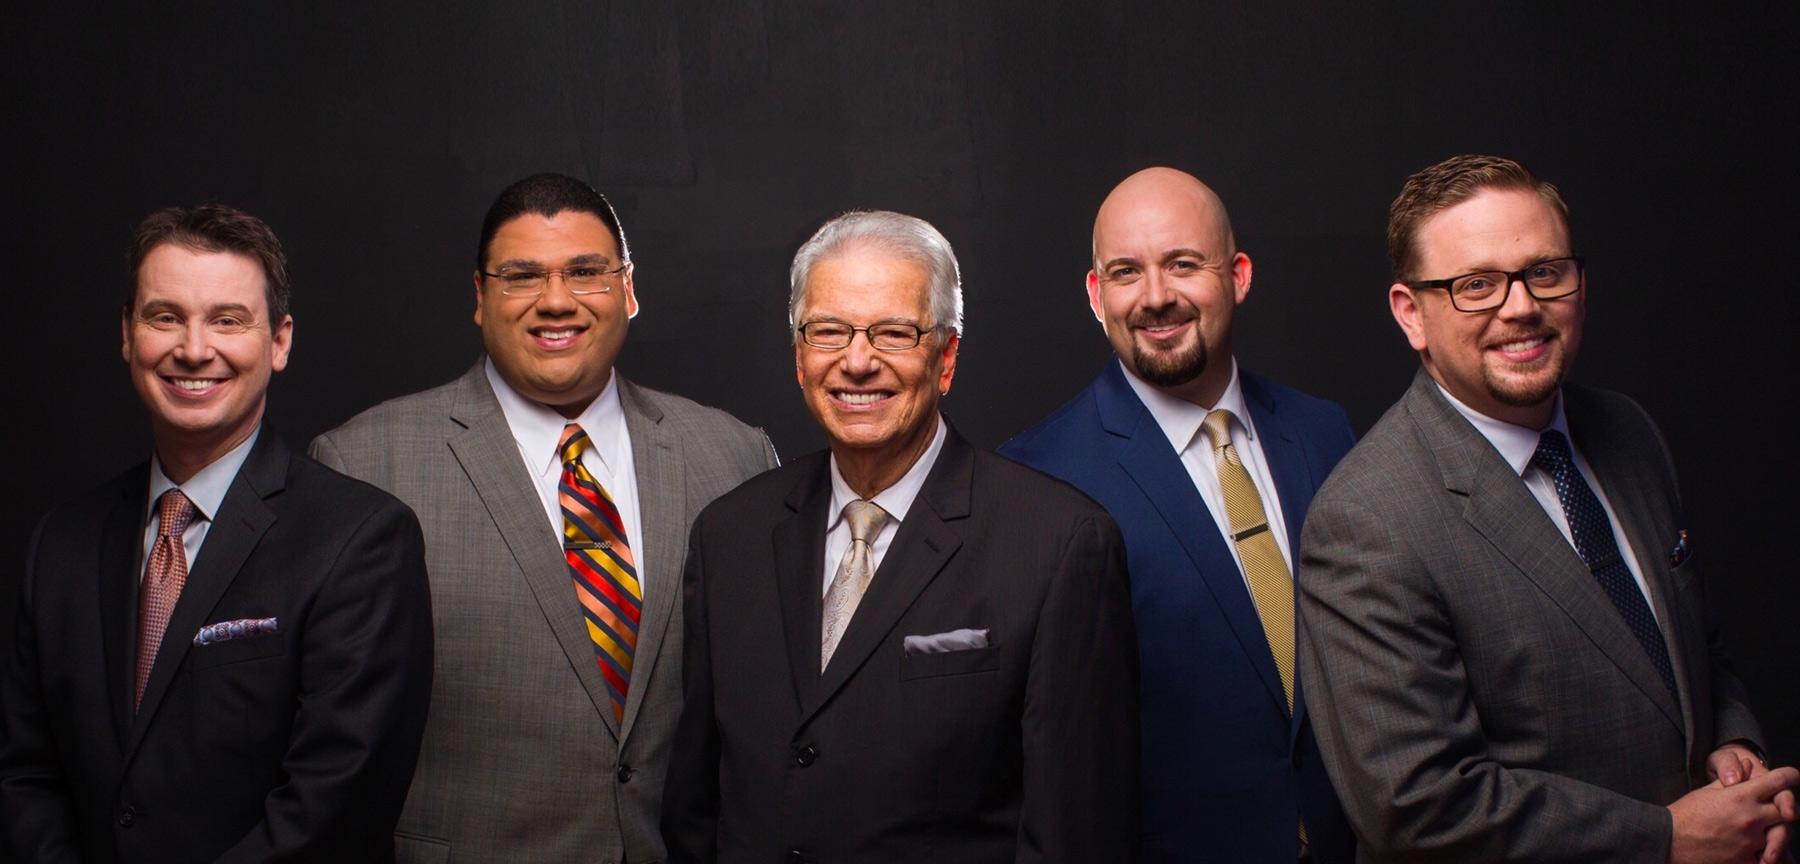 The Kingsmen Quartet